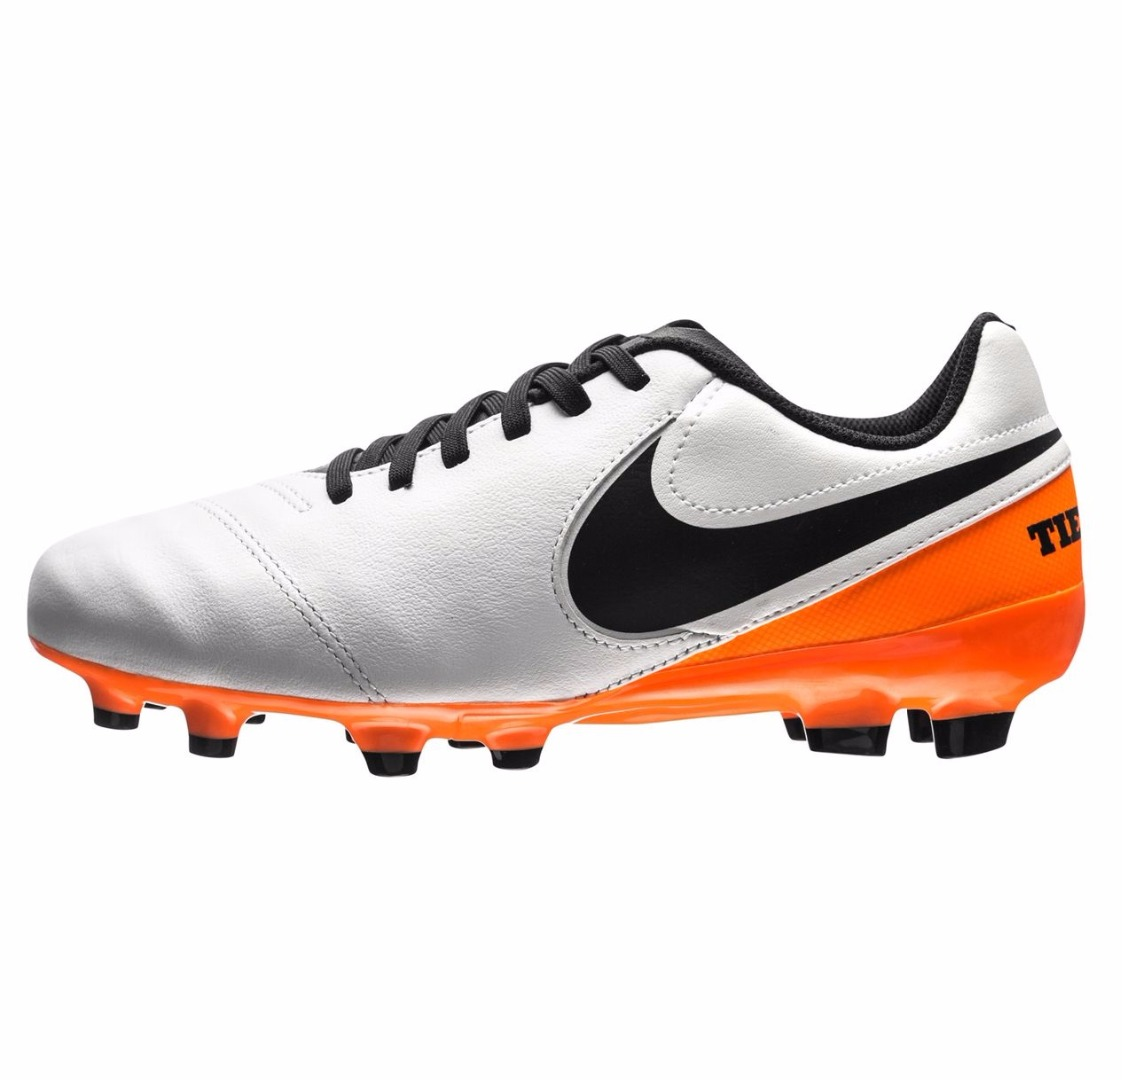 47f3663f Бутсы Nike Tiempo Legend VI FG 819186-108 JR